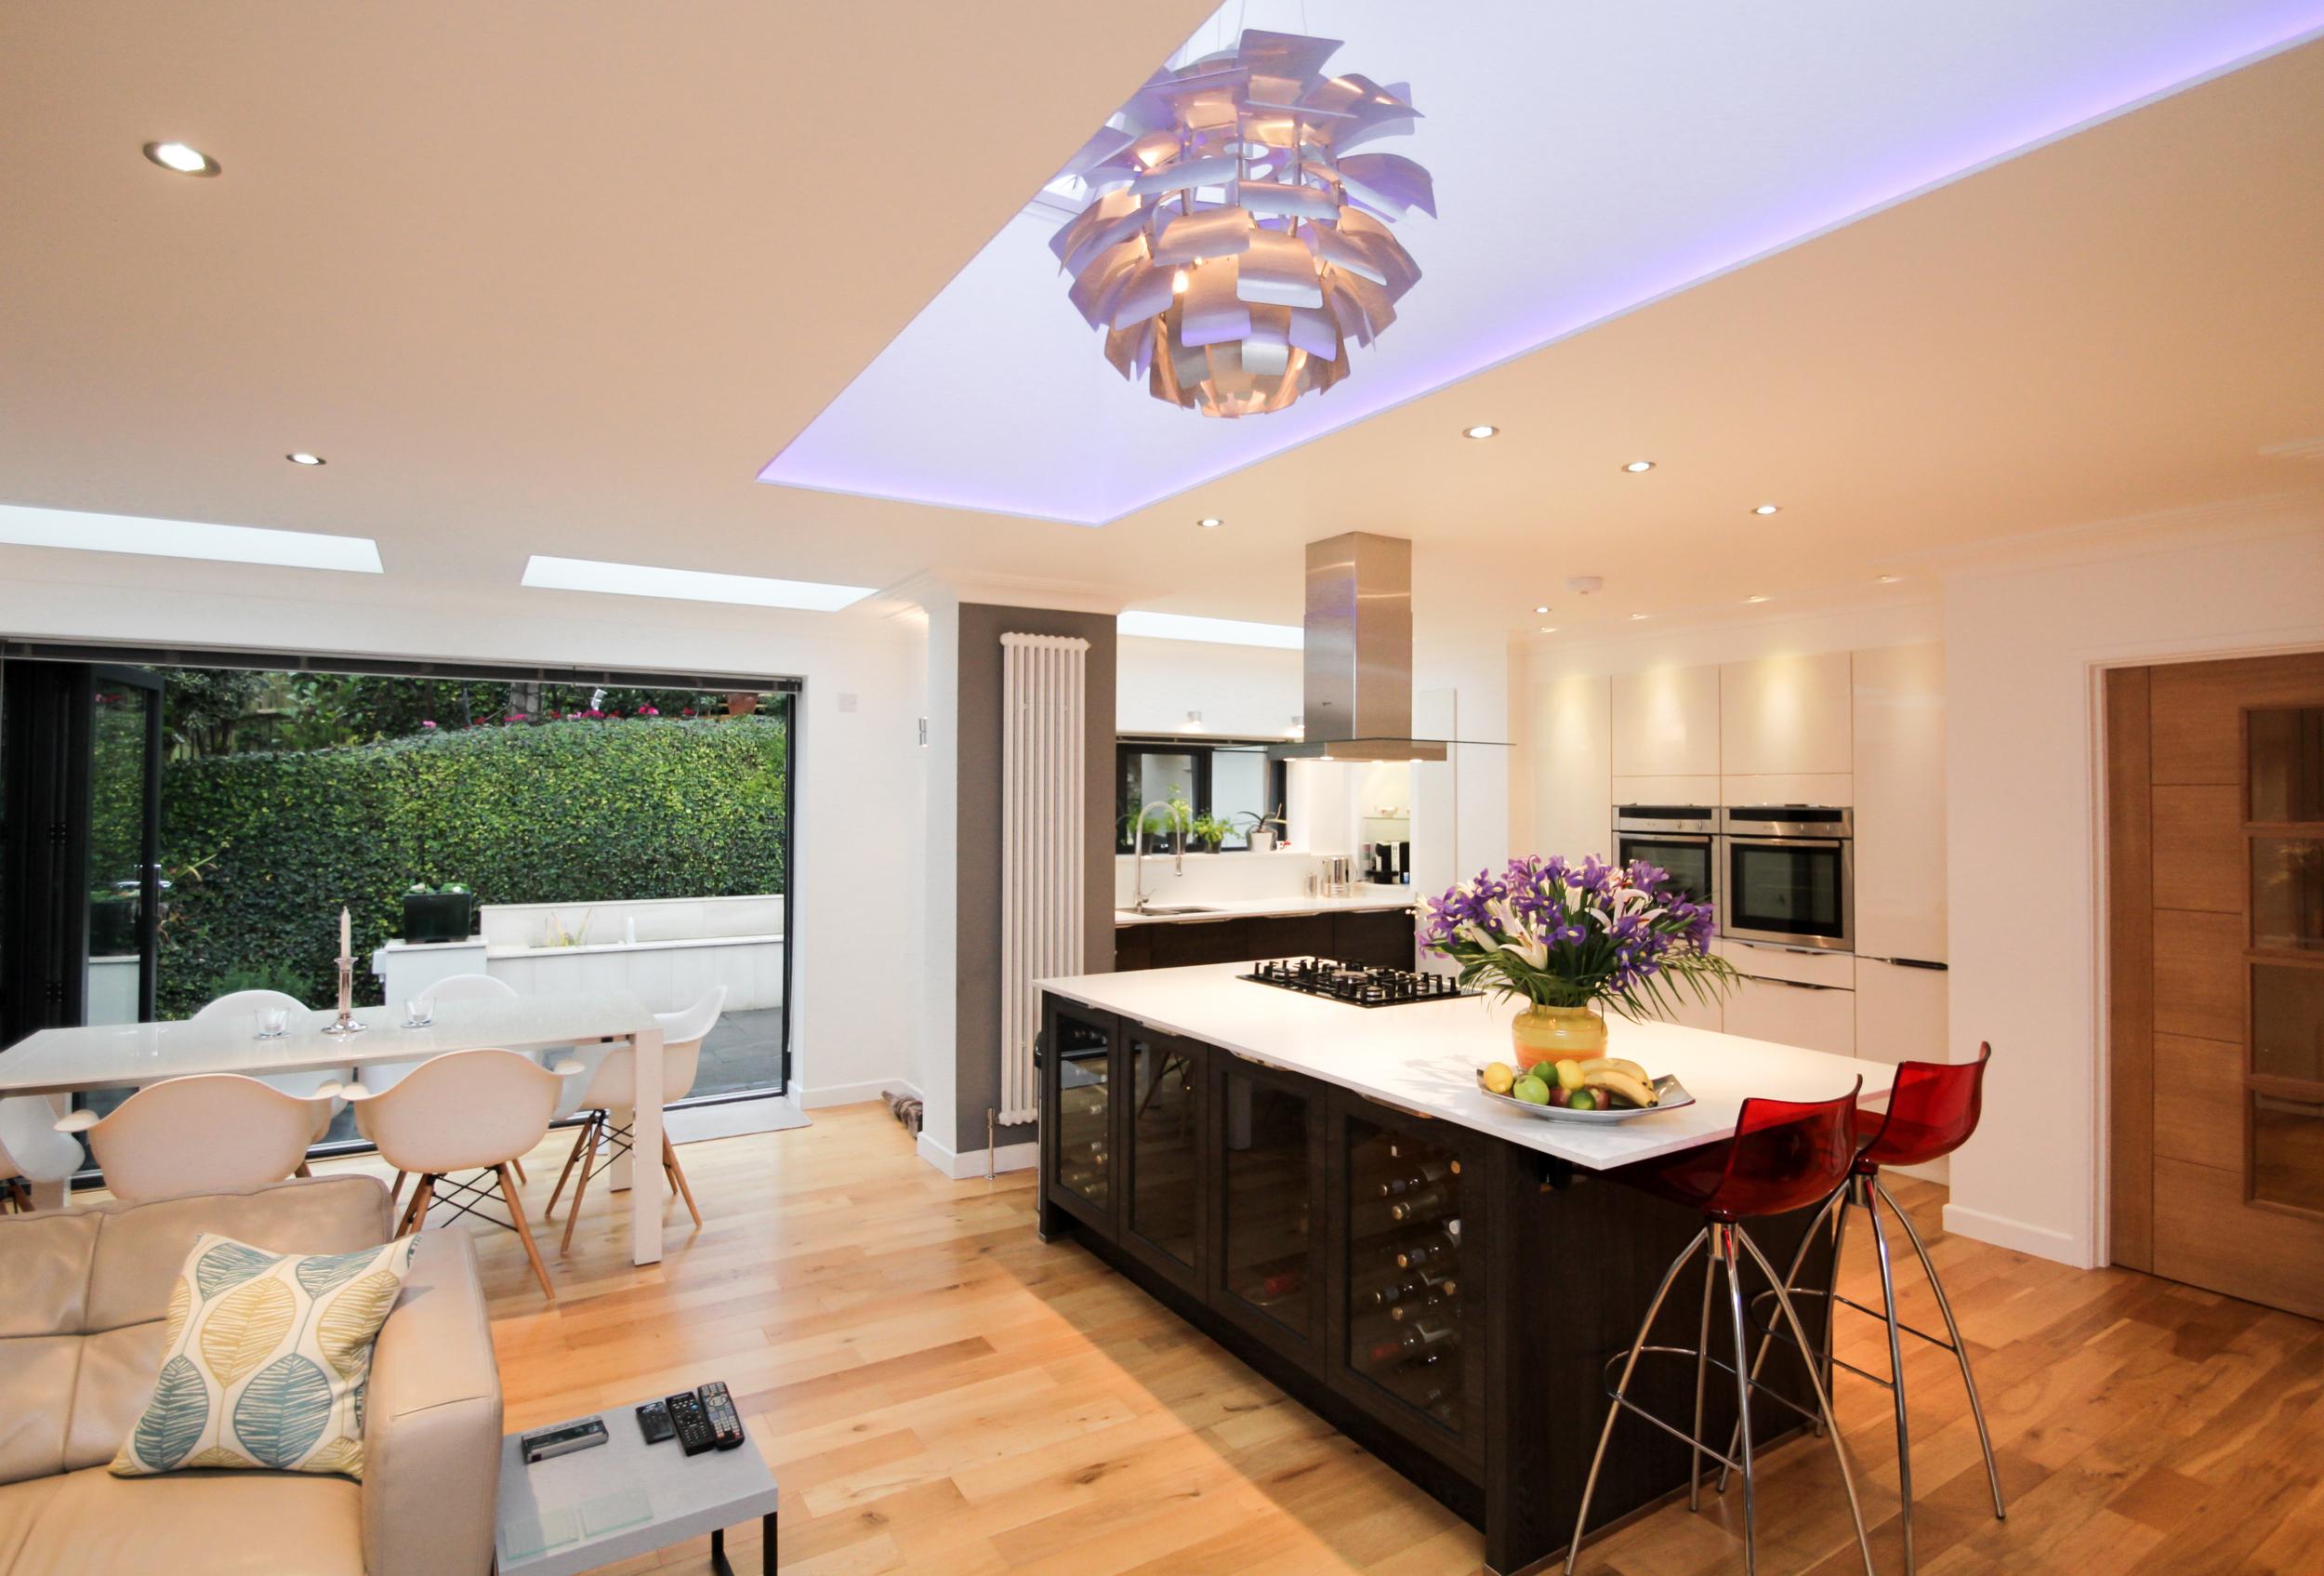 Kitchen Ovens 2.jpg